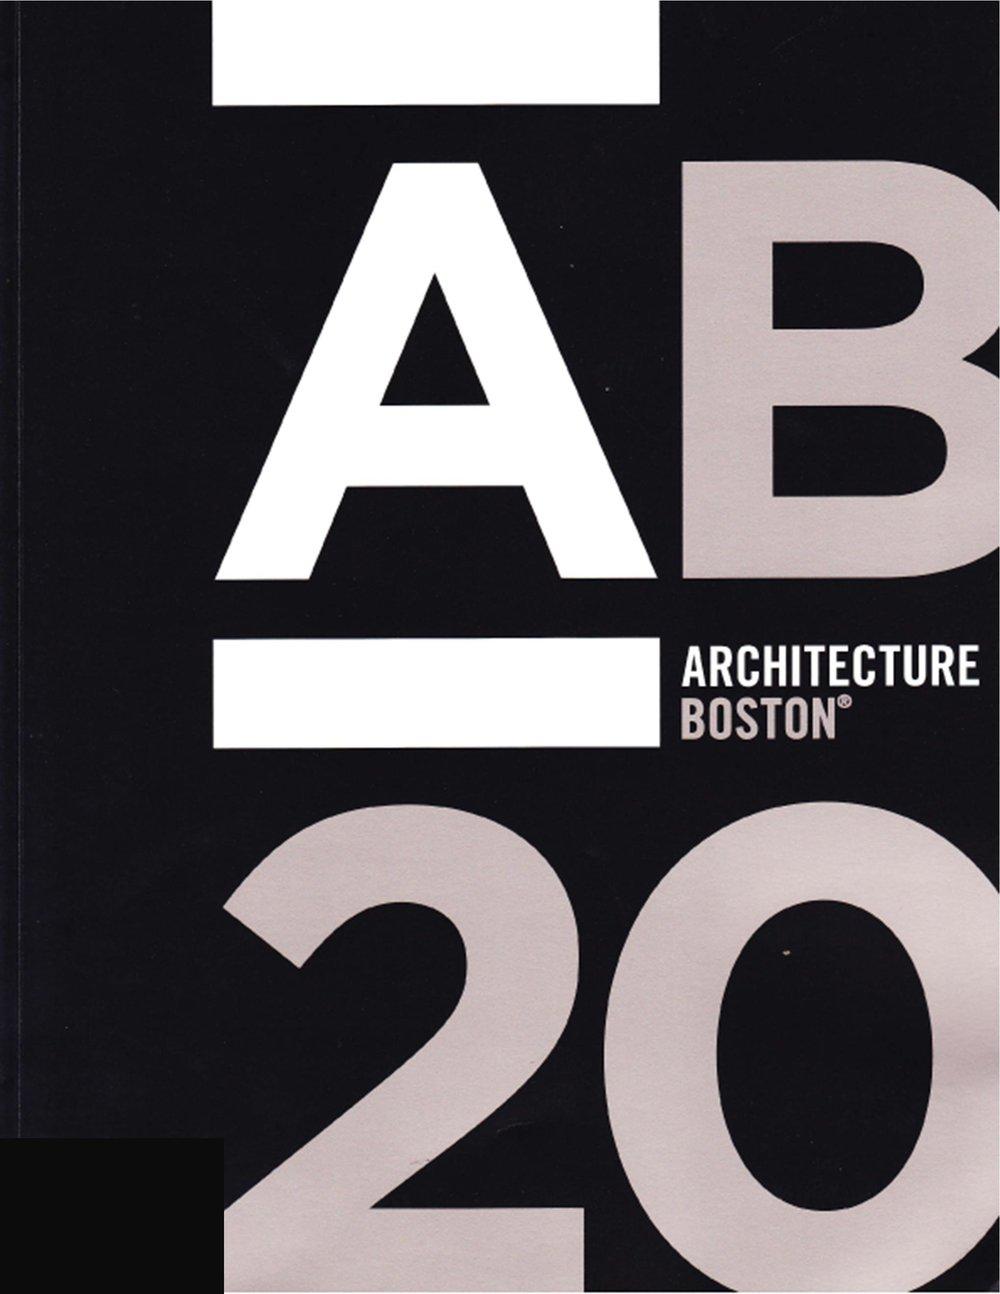 Arch Boston Fall 2017 cover edited.jpg